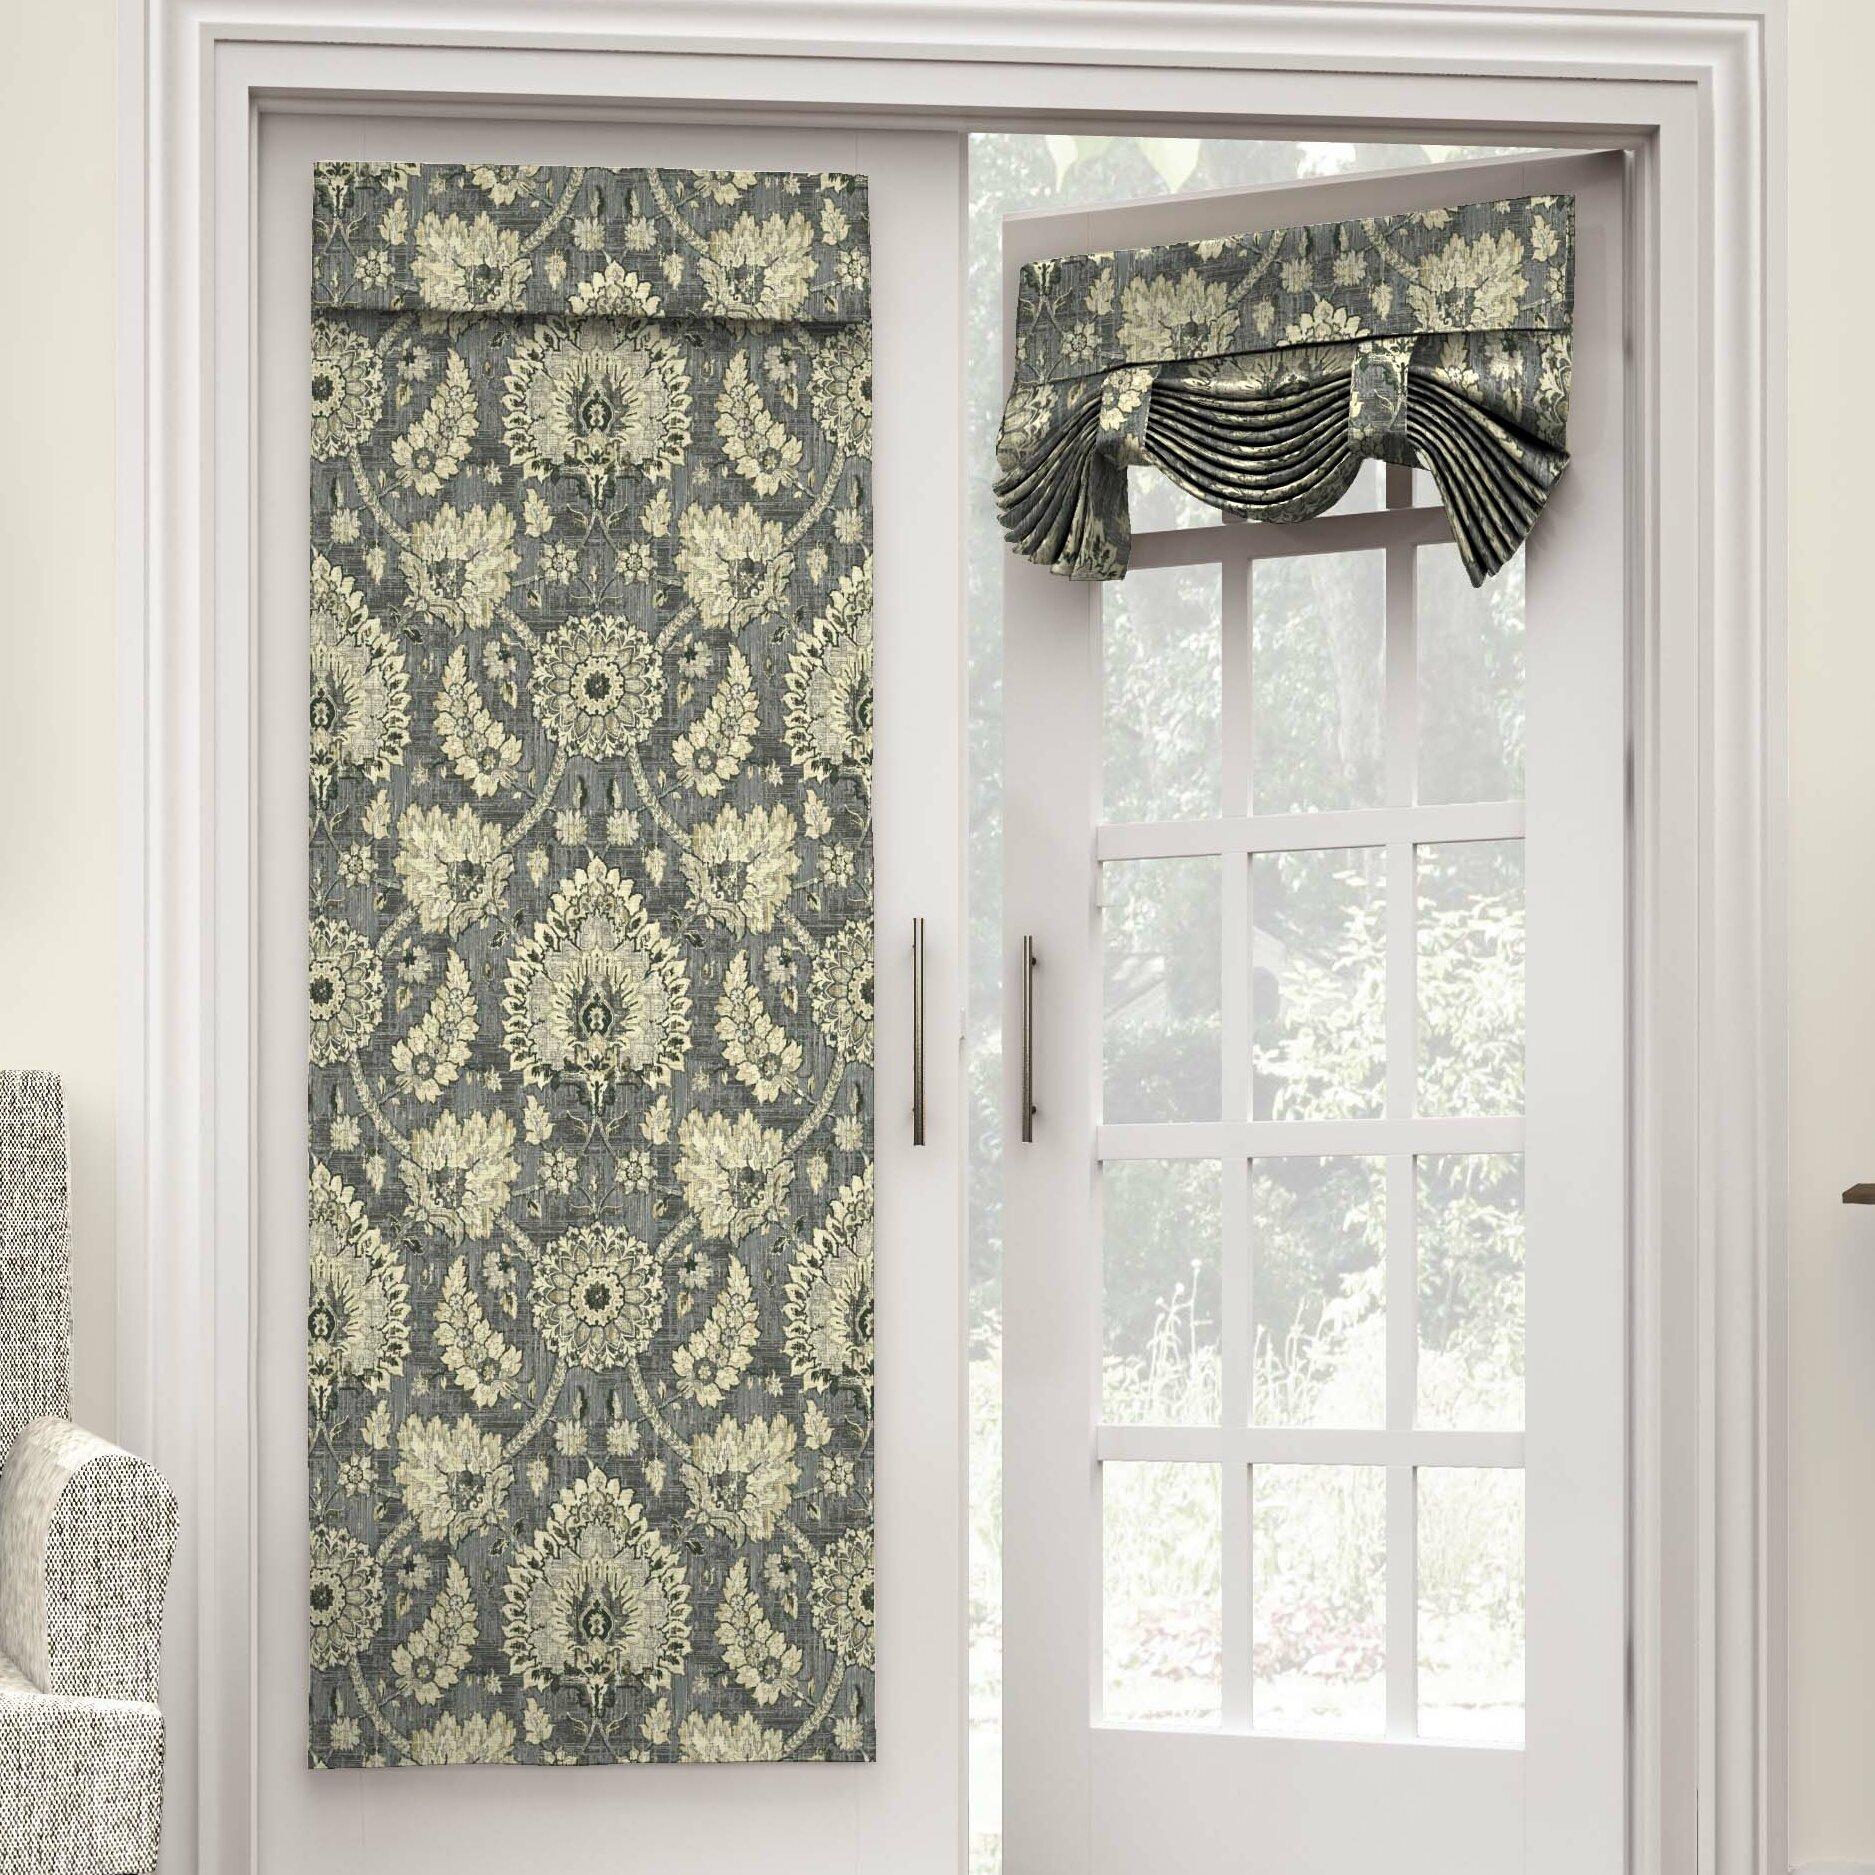 Velcro french door curtain panels - Velcro French Door Curtain Panels